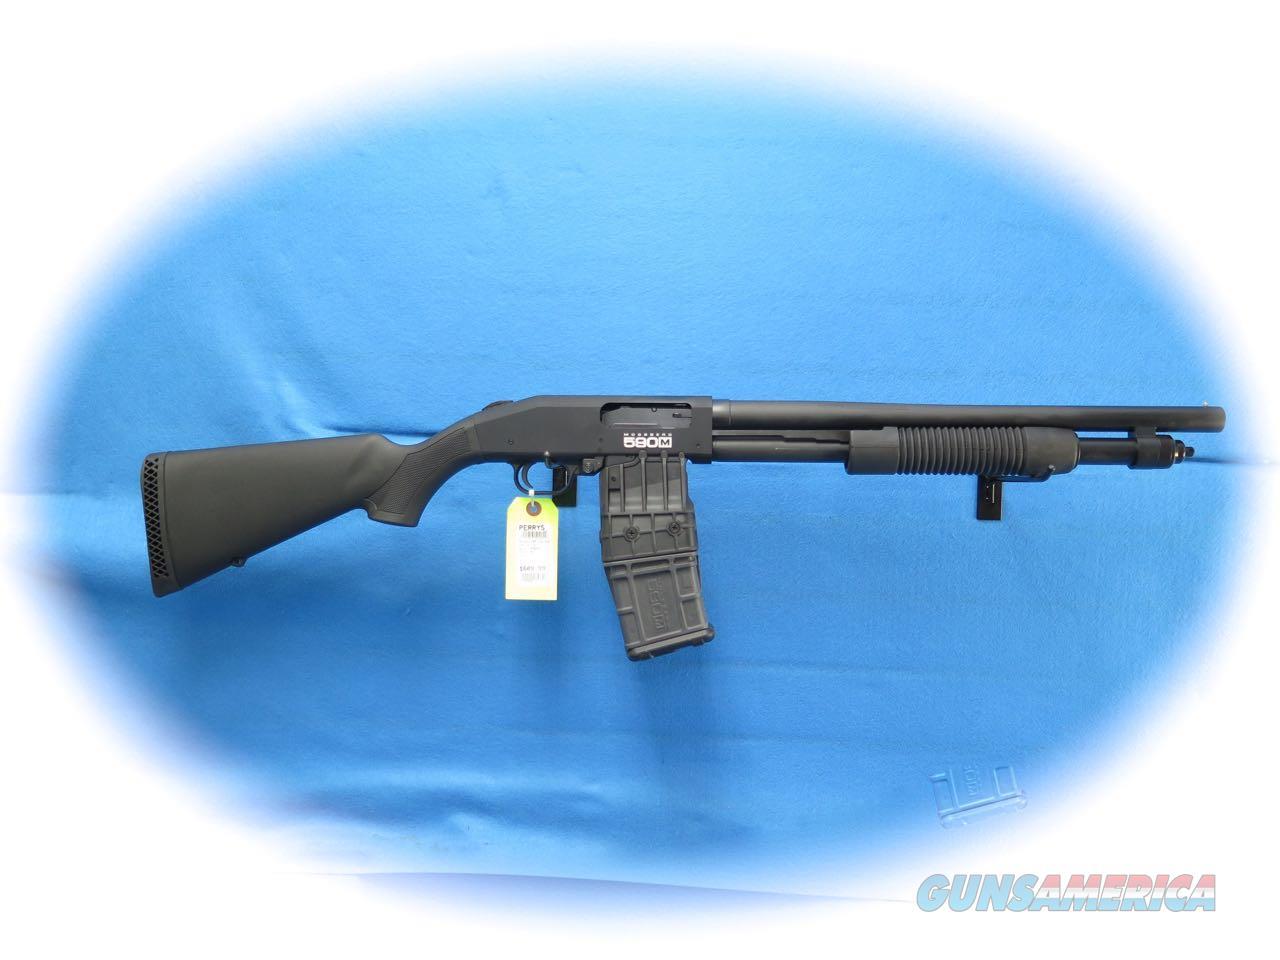 Mossberg 590M 12 Ga Pump Shotgun Mag Fed **New**  Guns > Shotguns > Mossberg Shotguns > Pump > Tactical